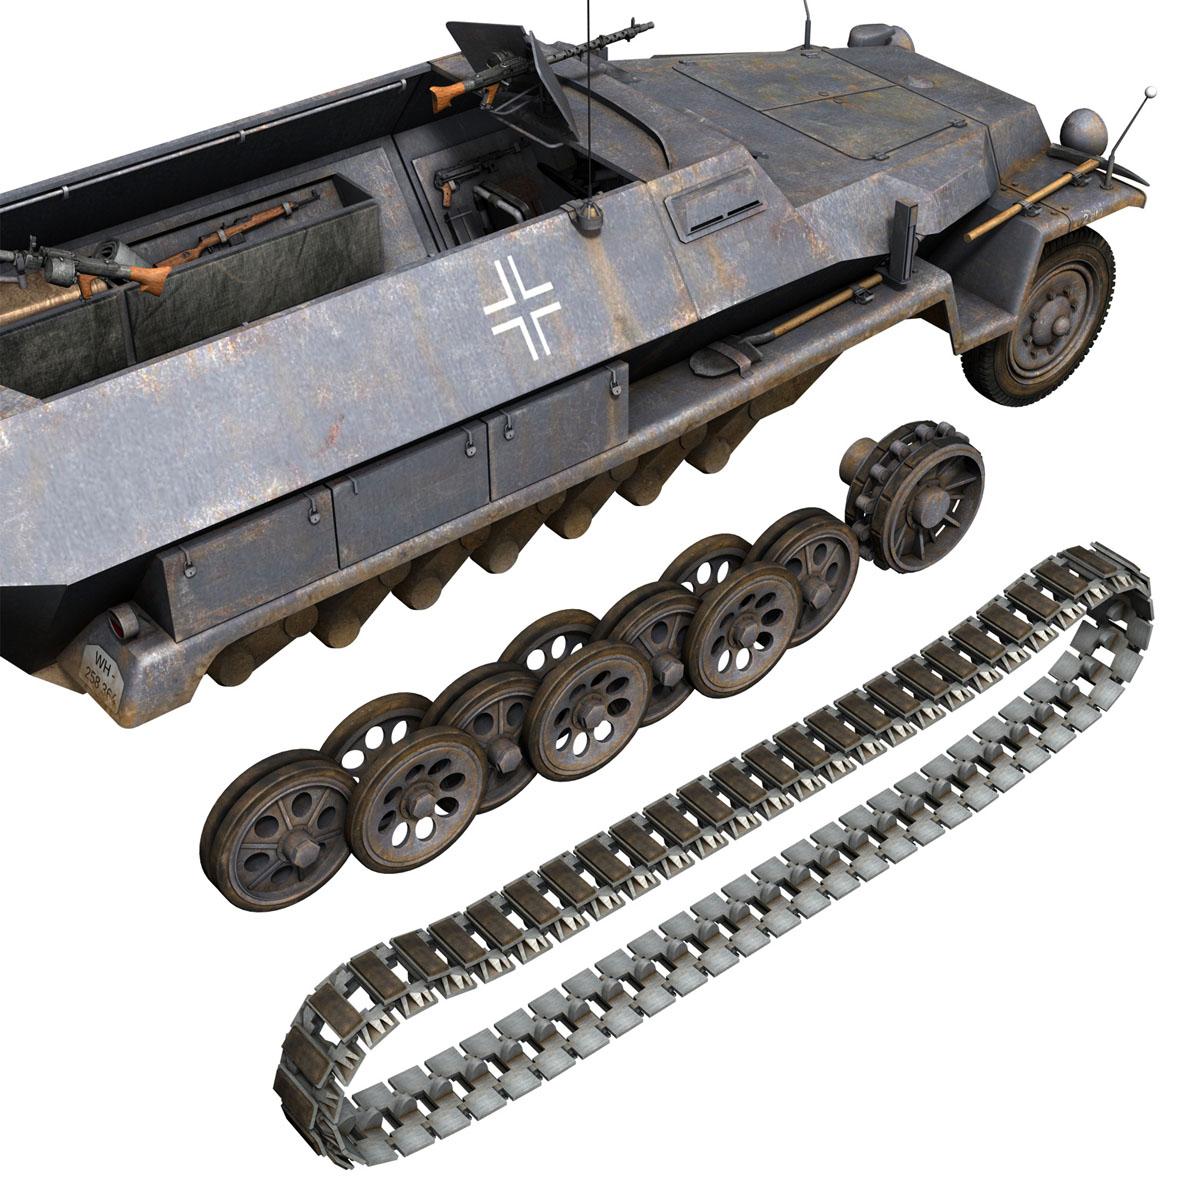 sd.kfz 251 1 ausf.c – half-track 3d model 3ds fbx c4d lwo obj 201398